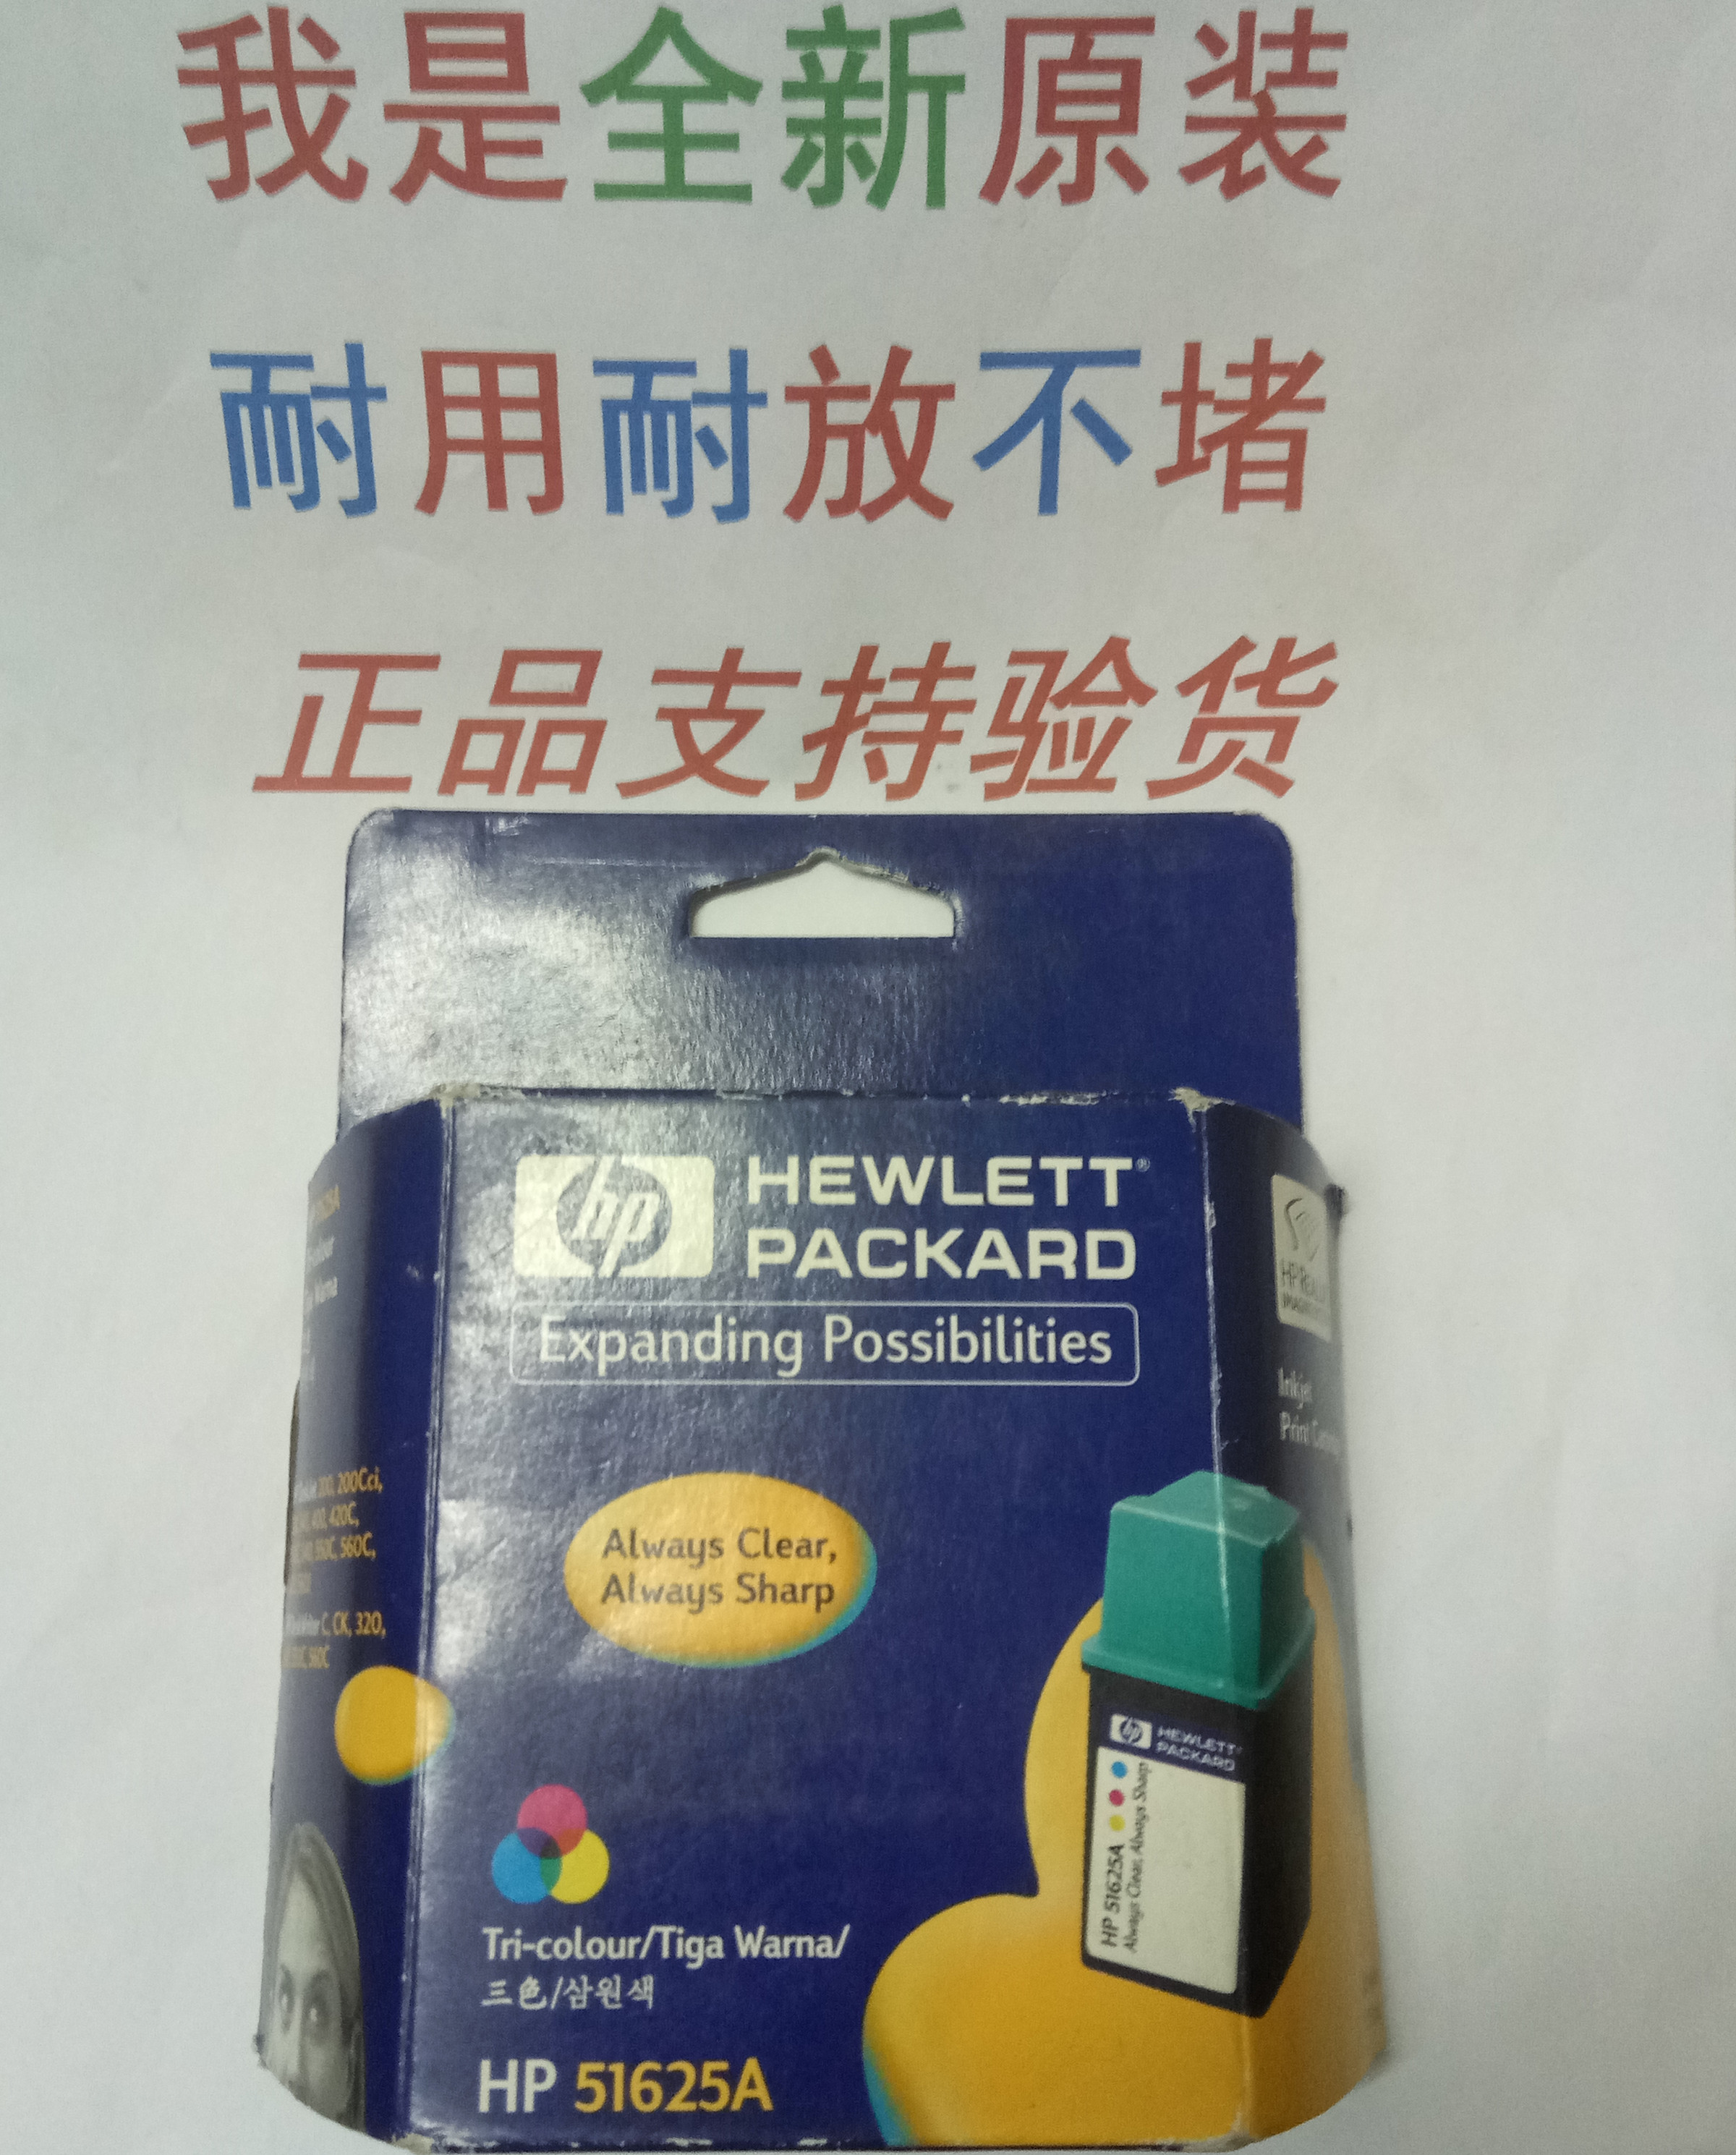 HP51625/惠普25A墨盒 适用HP200、320/340/420/540/550/560打印机